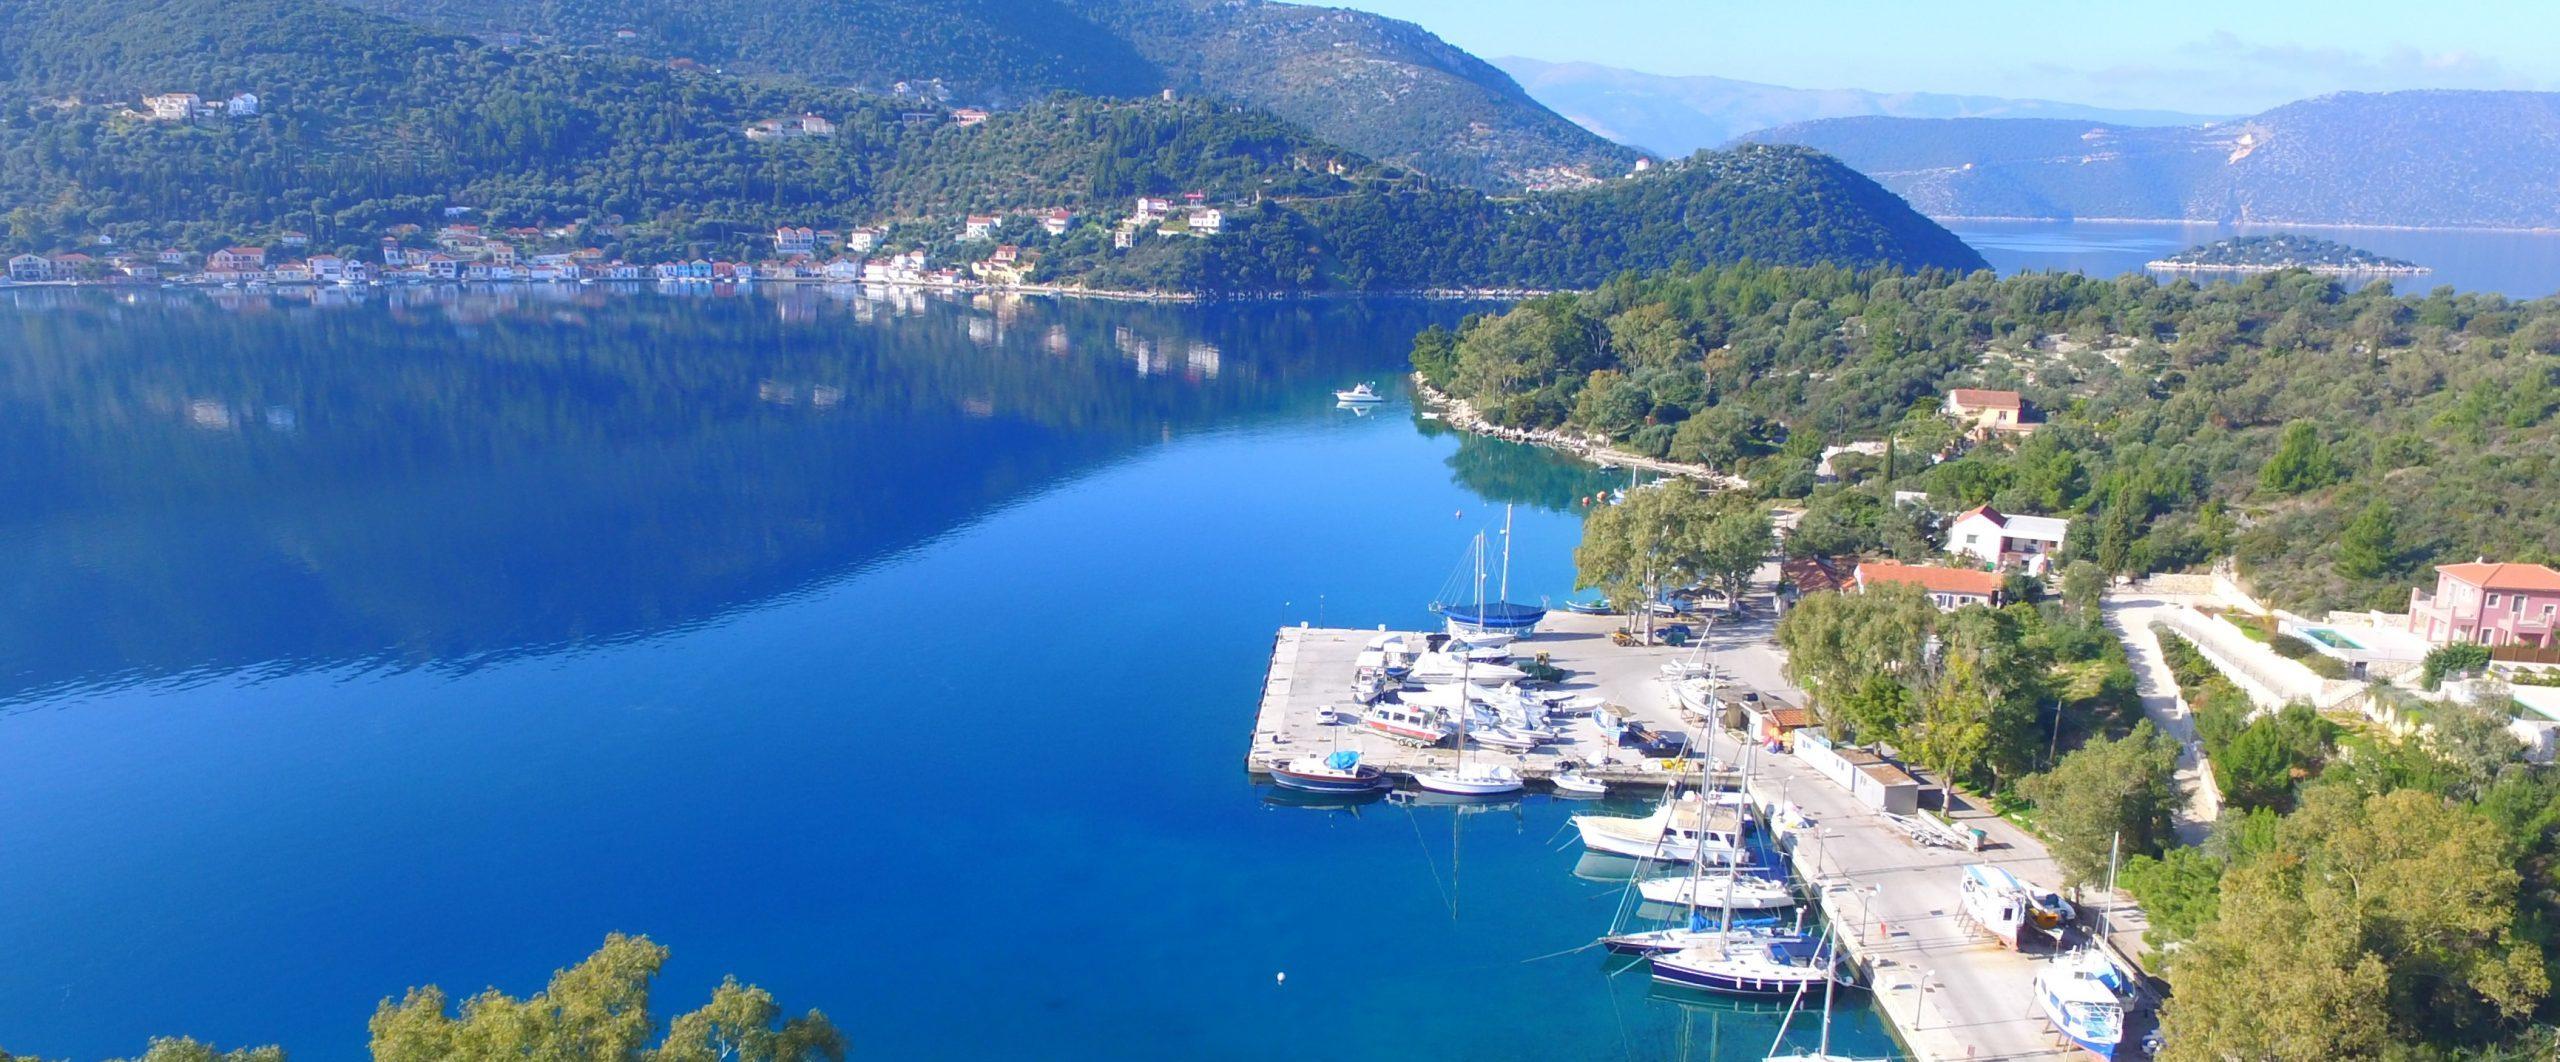 MV Properties, Ithaca Greece real estate, Vathi bay